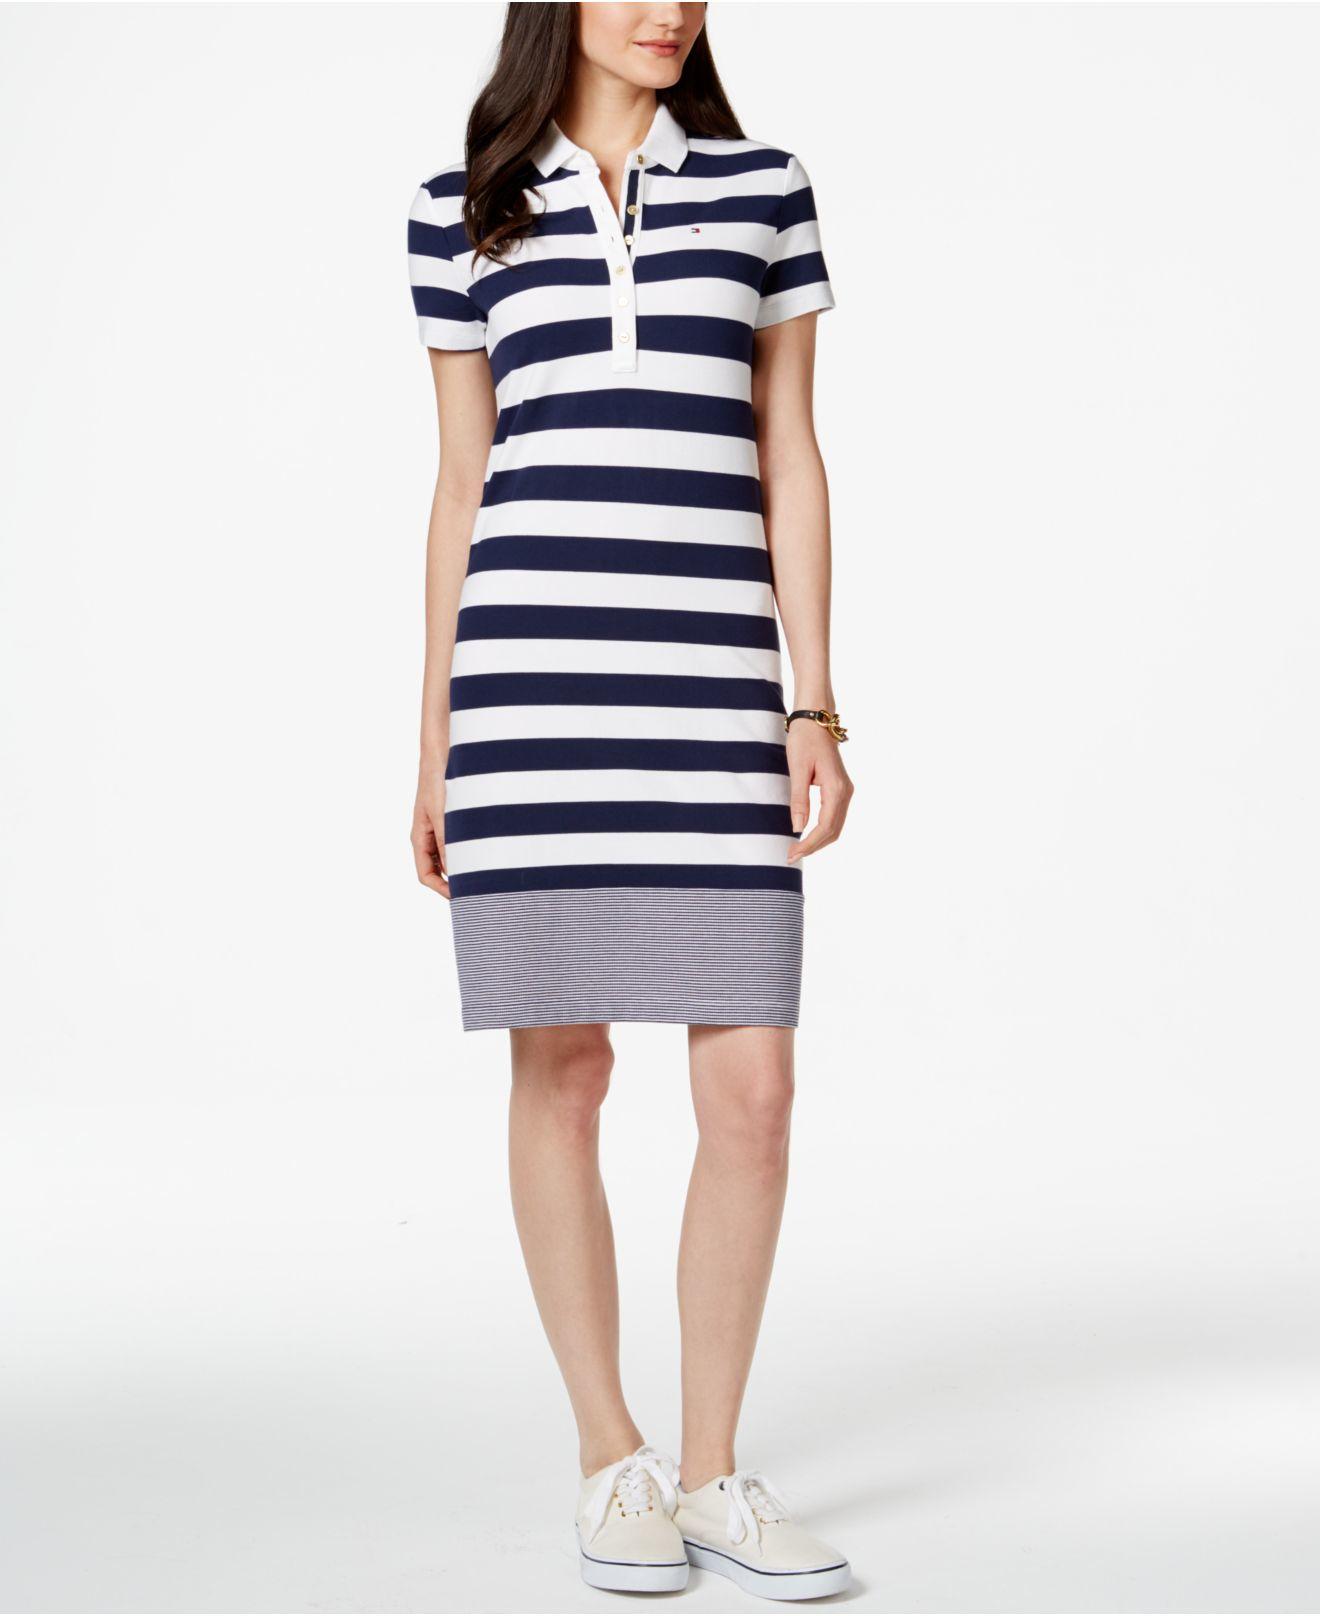 676f387c Tommy Hilfiger Miranda Short-sleeve Striped Polo Dress in White - Lyst